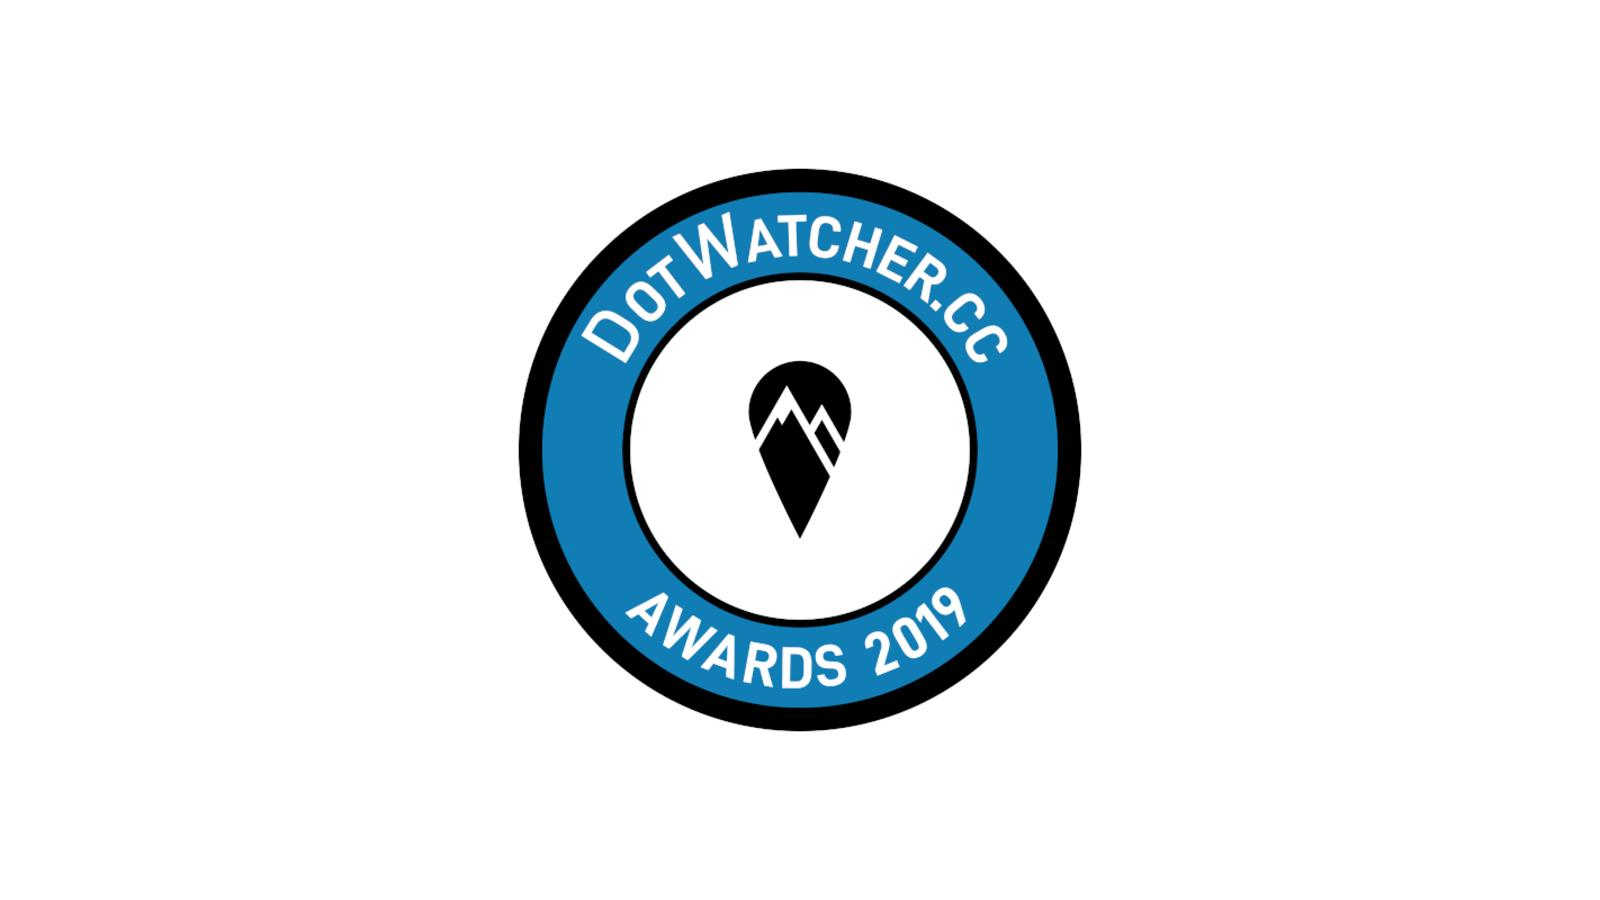 2019 DotWatcher Awards